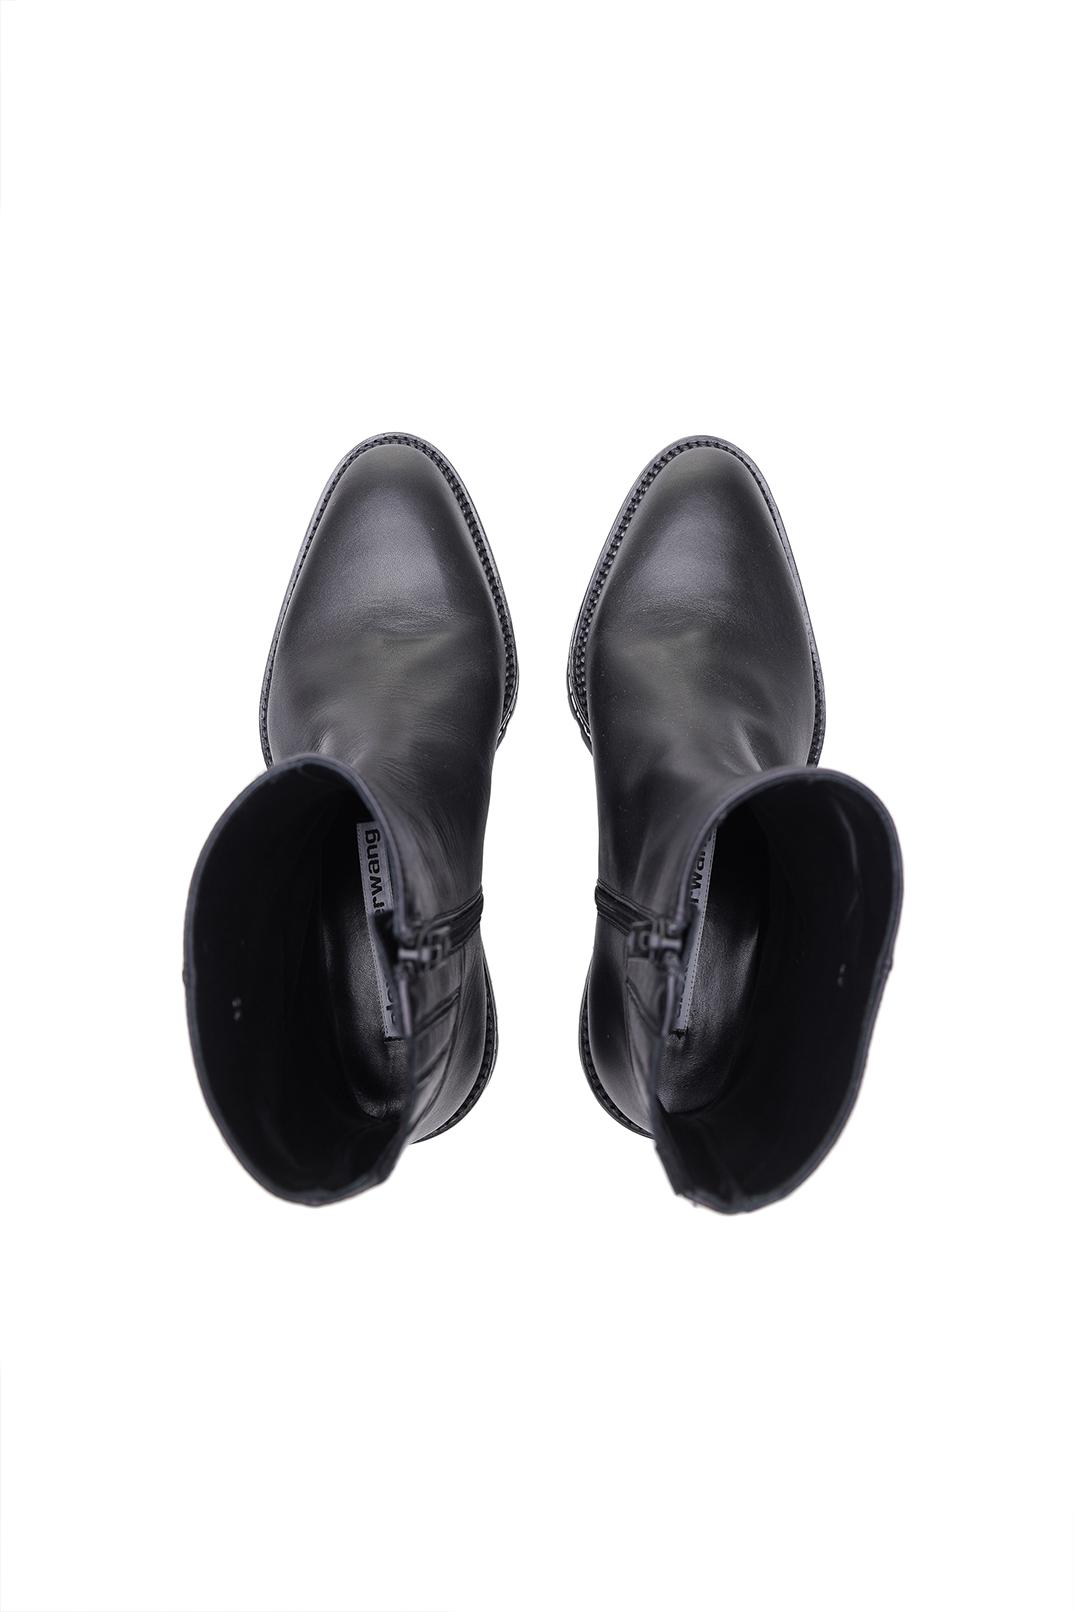 Ботинки Sanford ALEXANDER WANG AWsh21005